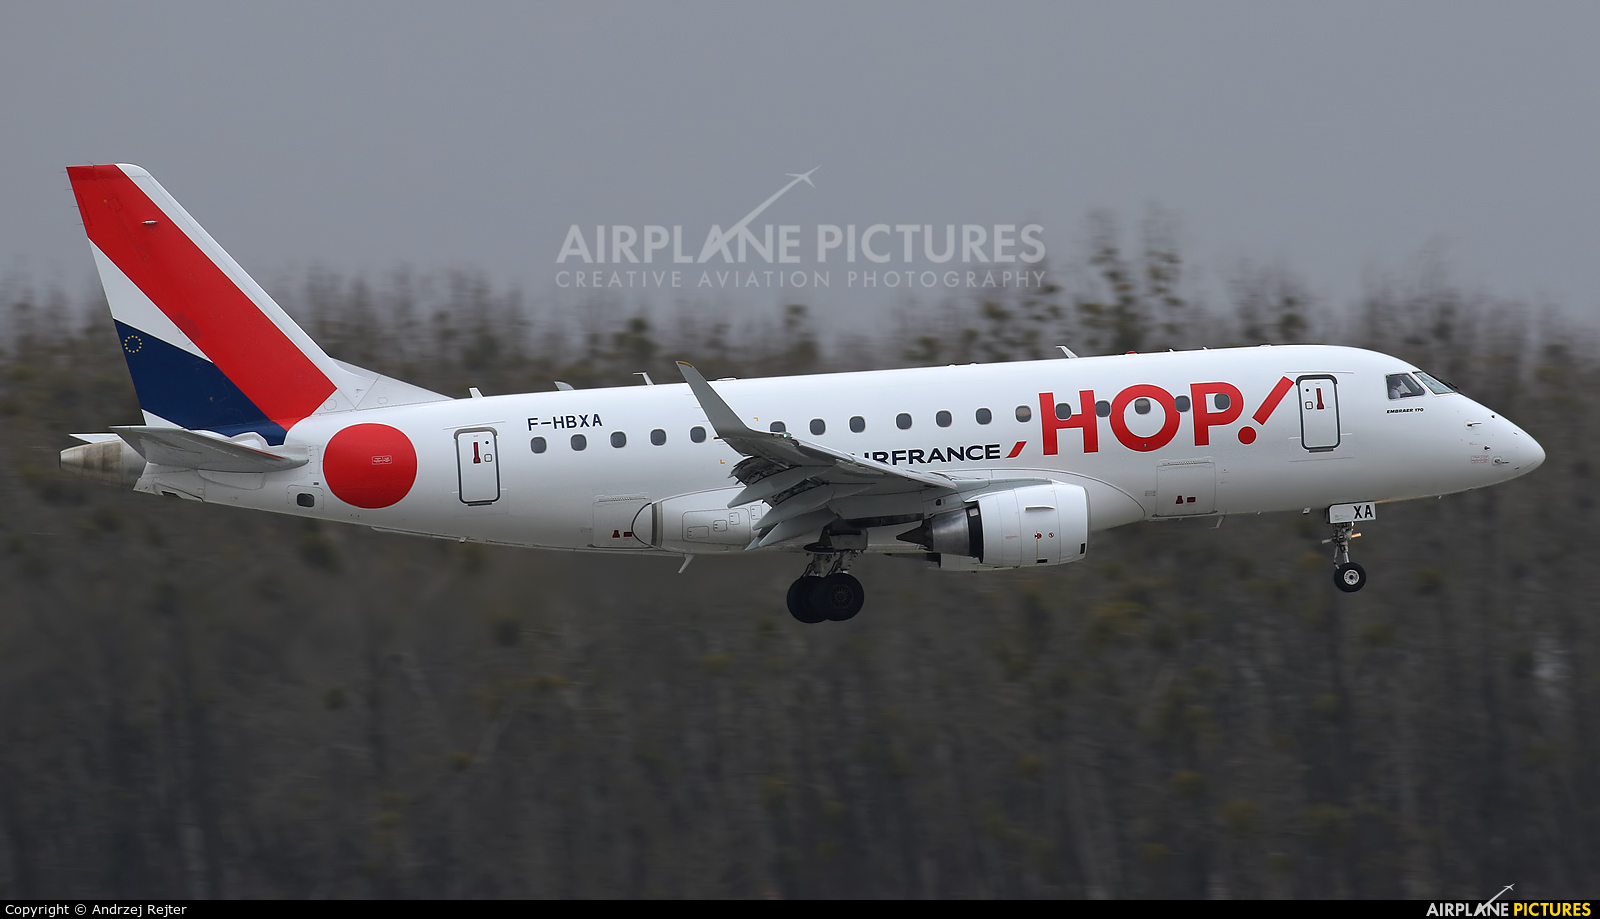 Air France - Hop! F-HBXA aircraft at Wrocław - Copernicus